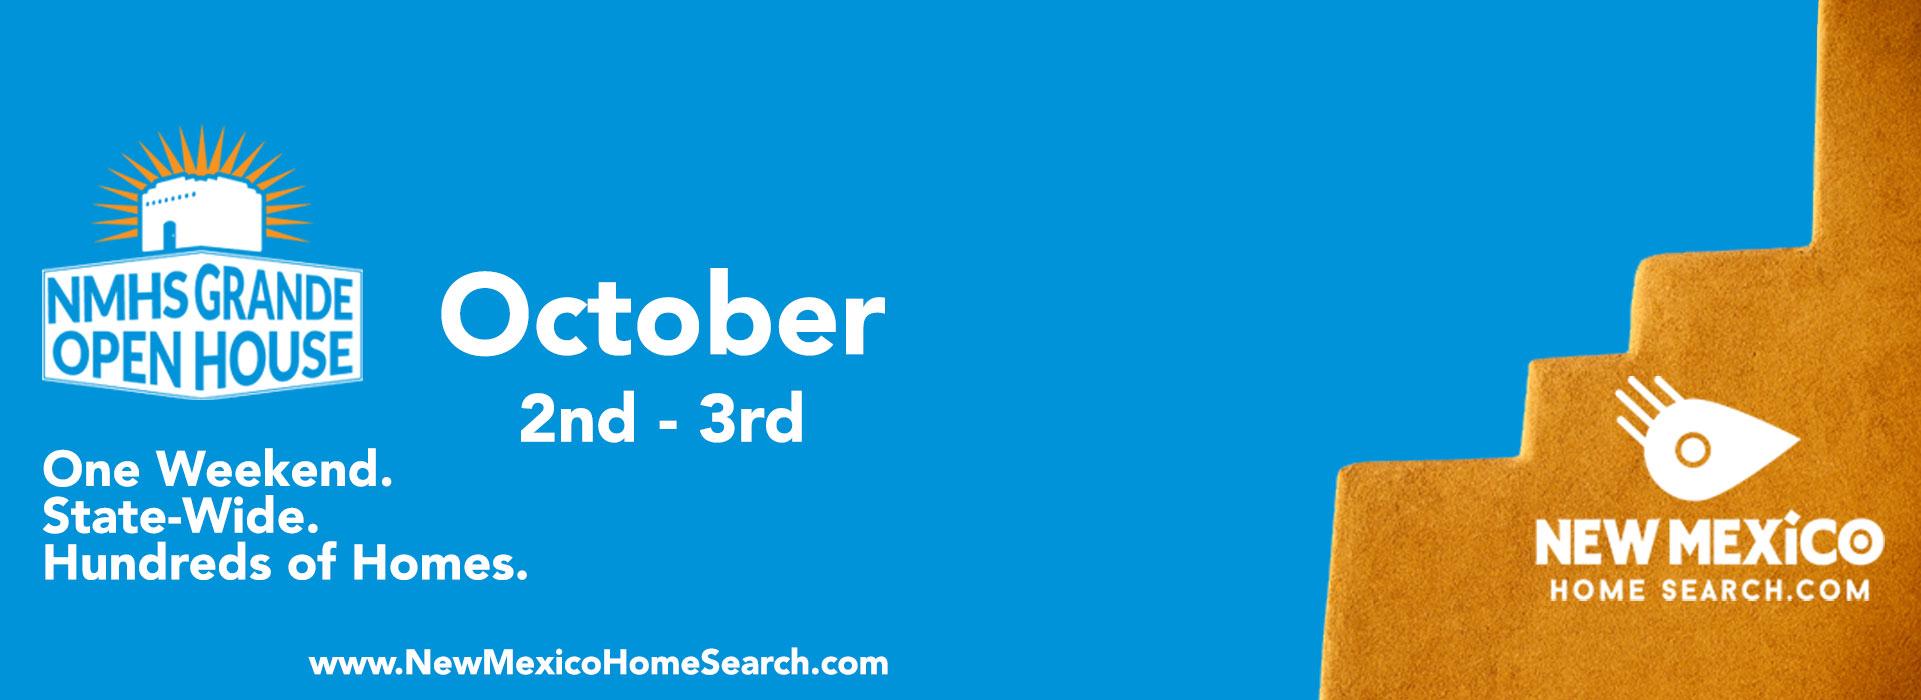 Grande Open House Weekend is October 2nd & 3rd